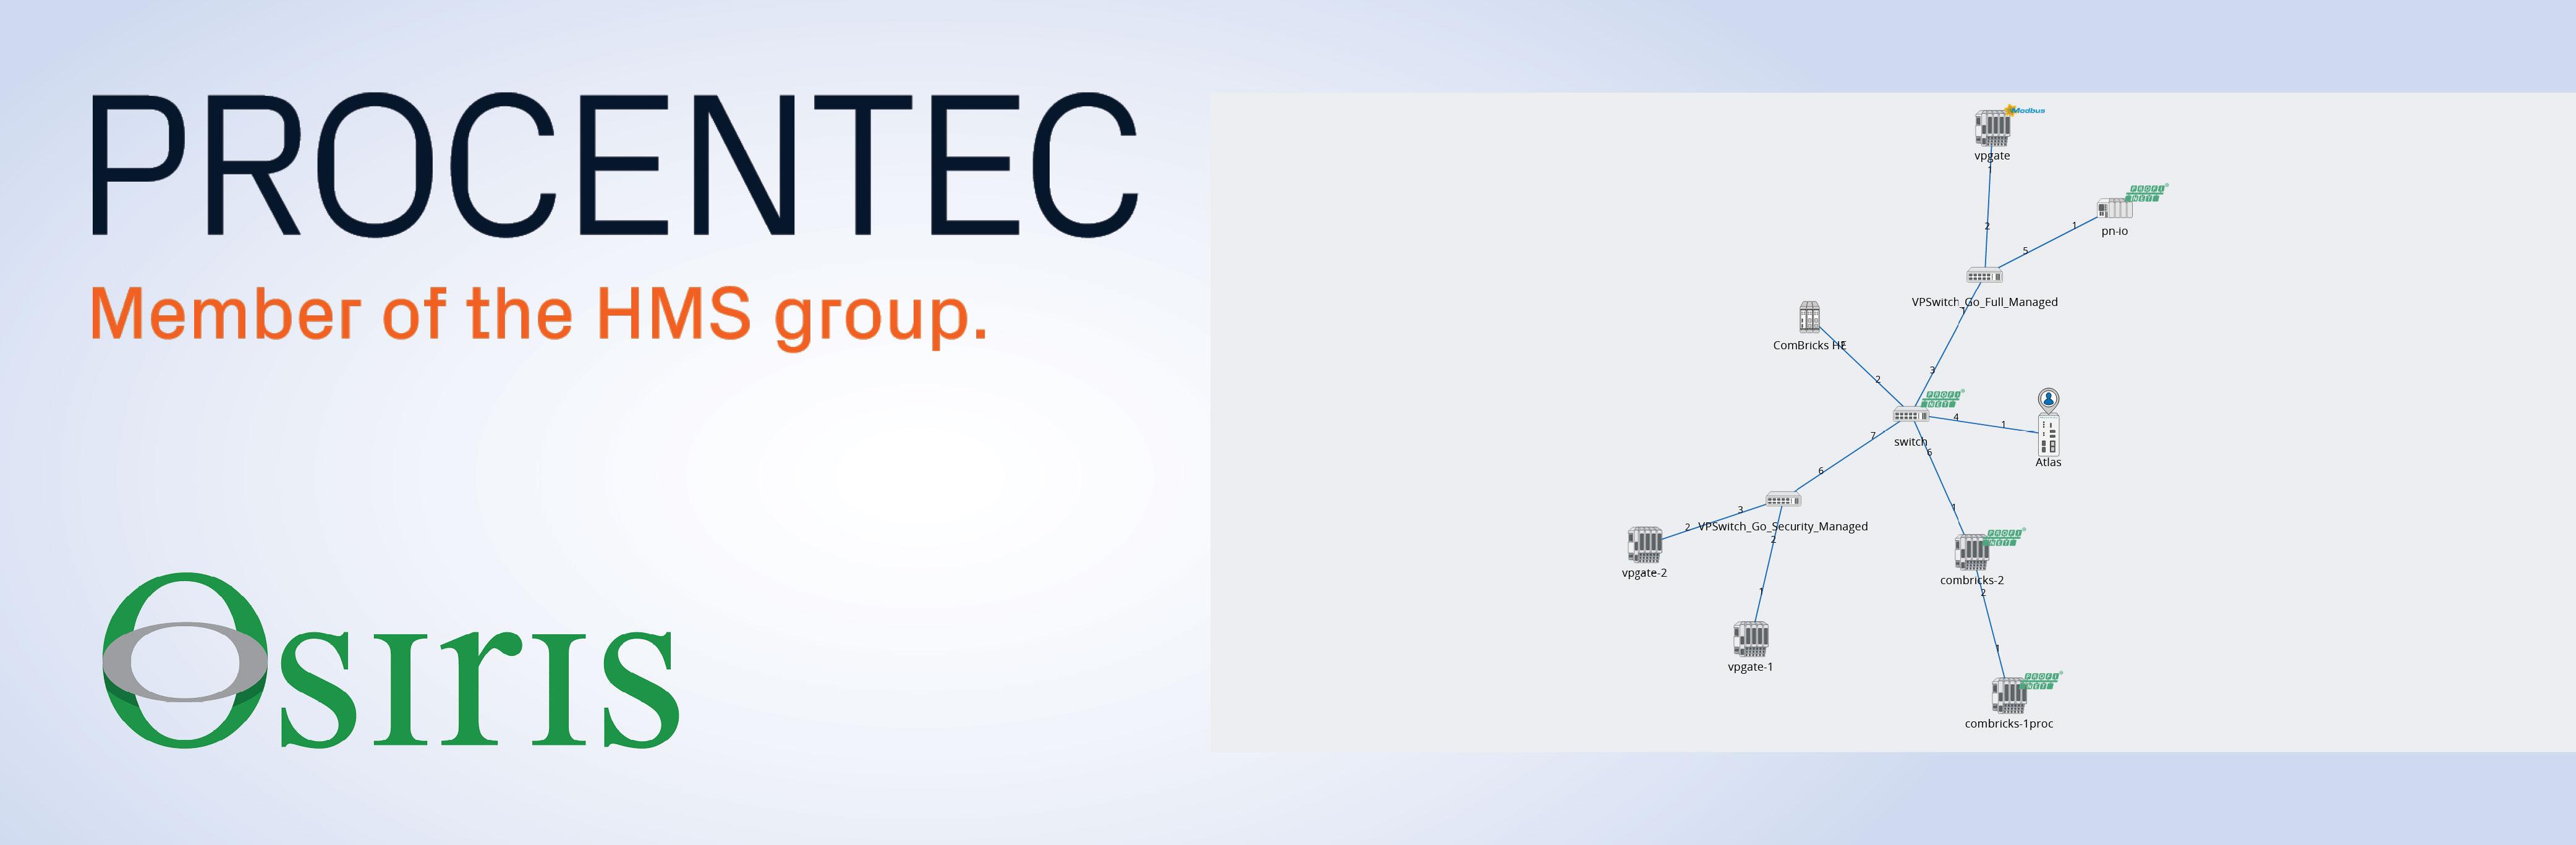 procentec-banner